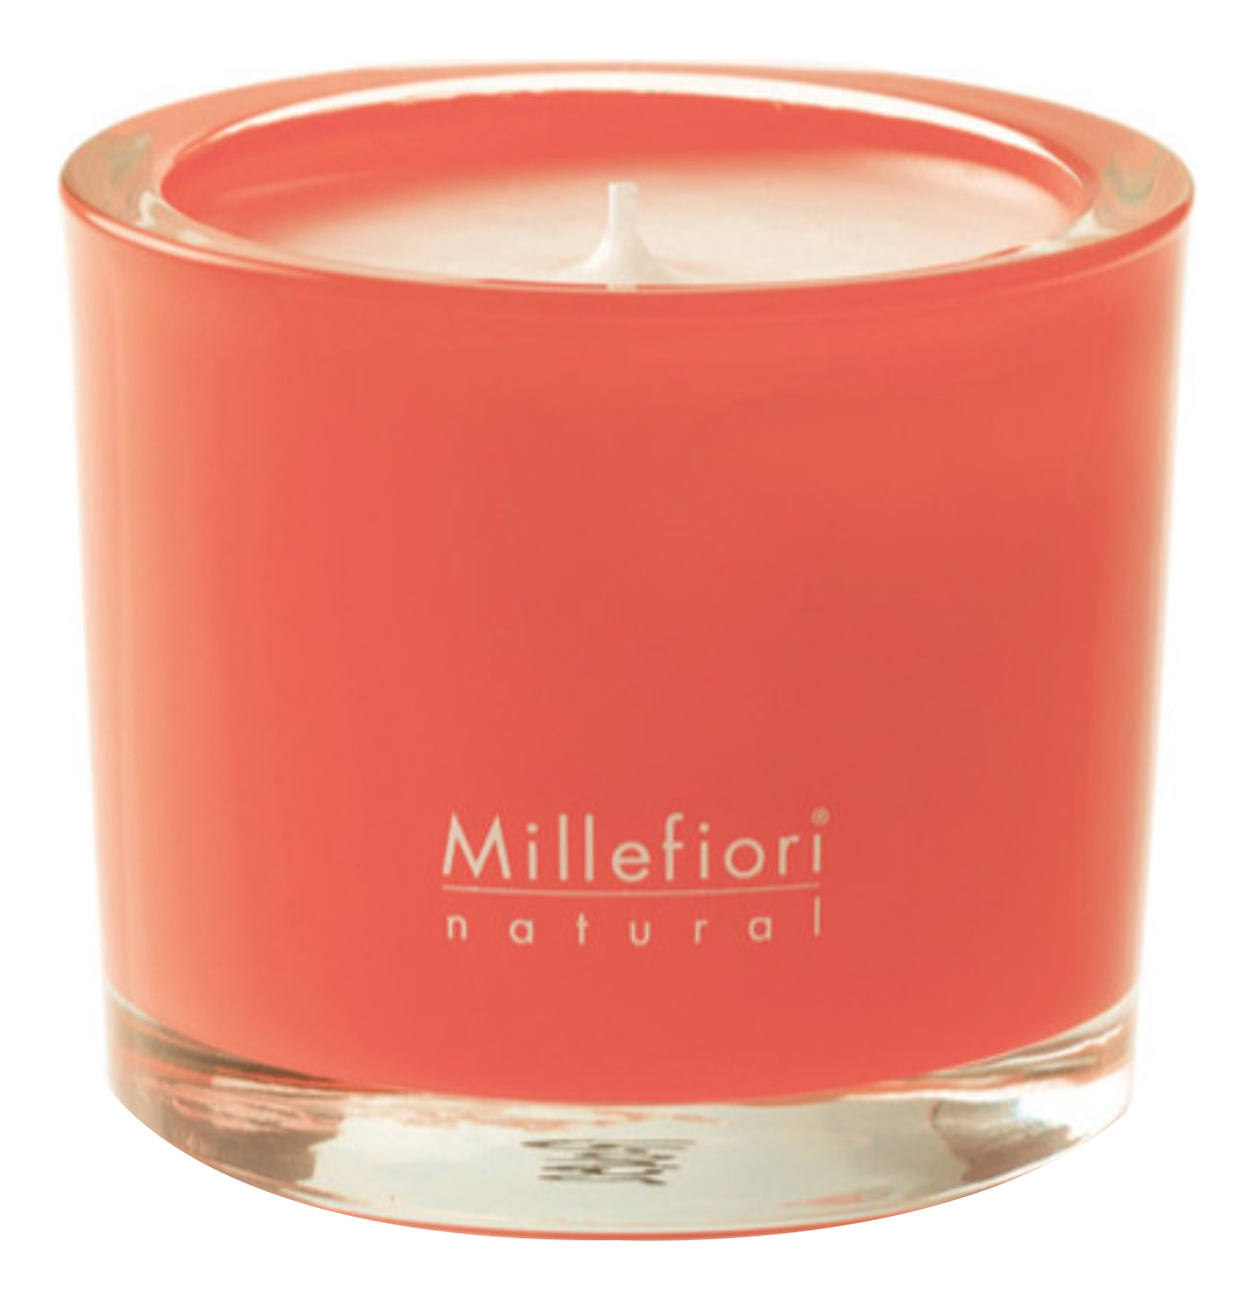 Ароматическая свеча Оттенки Миндаля Natural Almond Blush 180г фото